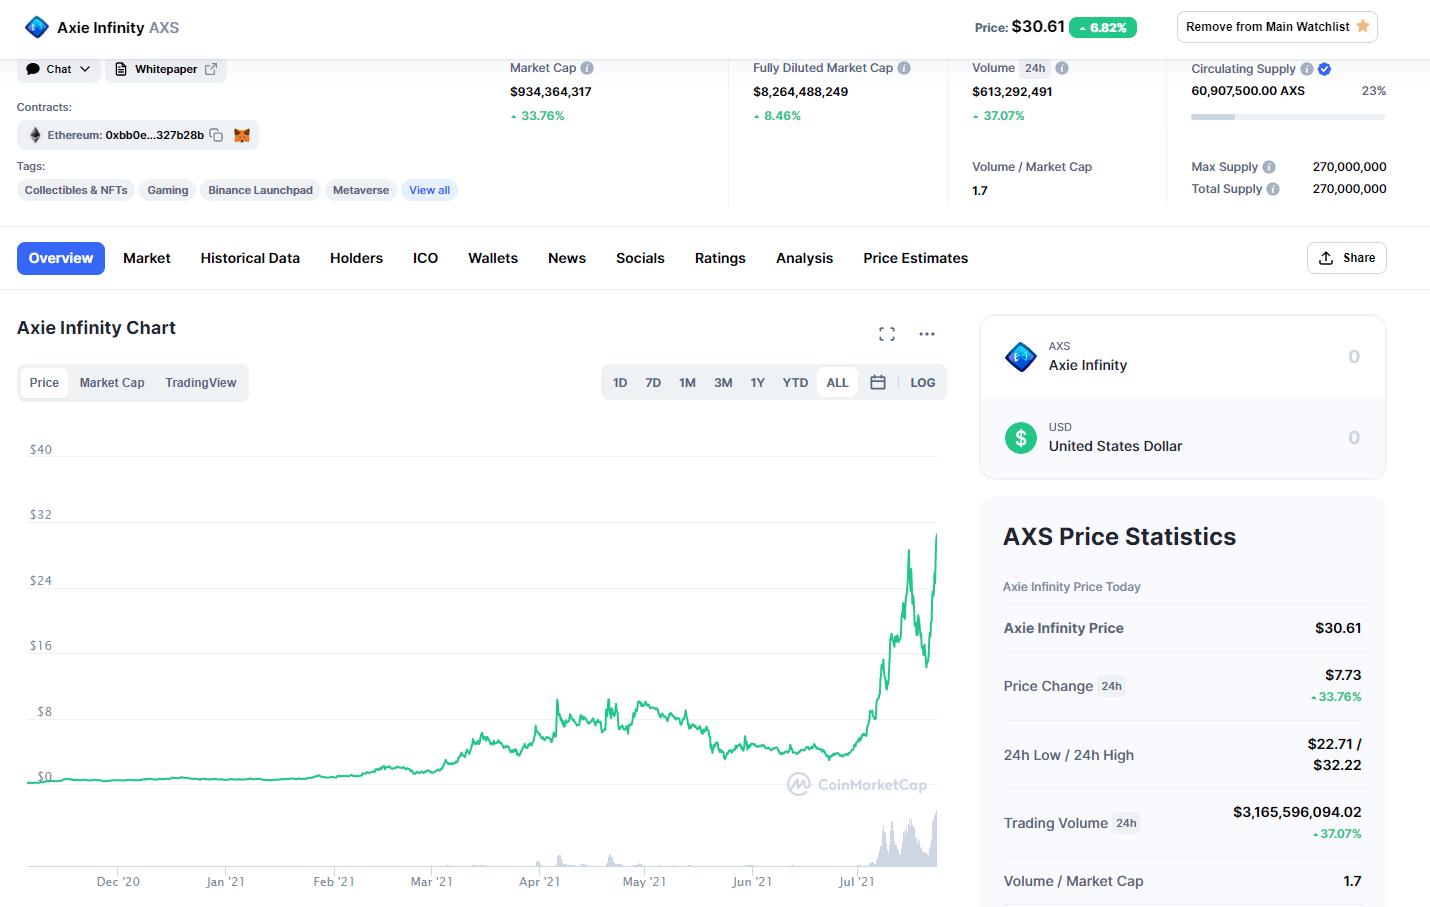 AXS axie infinity - đầu tư cryptocurrency